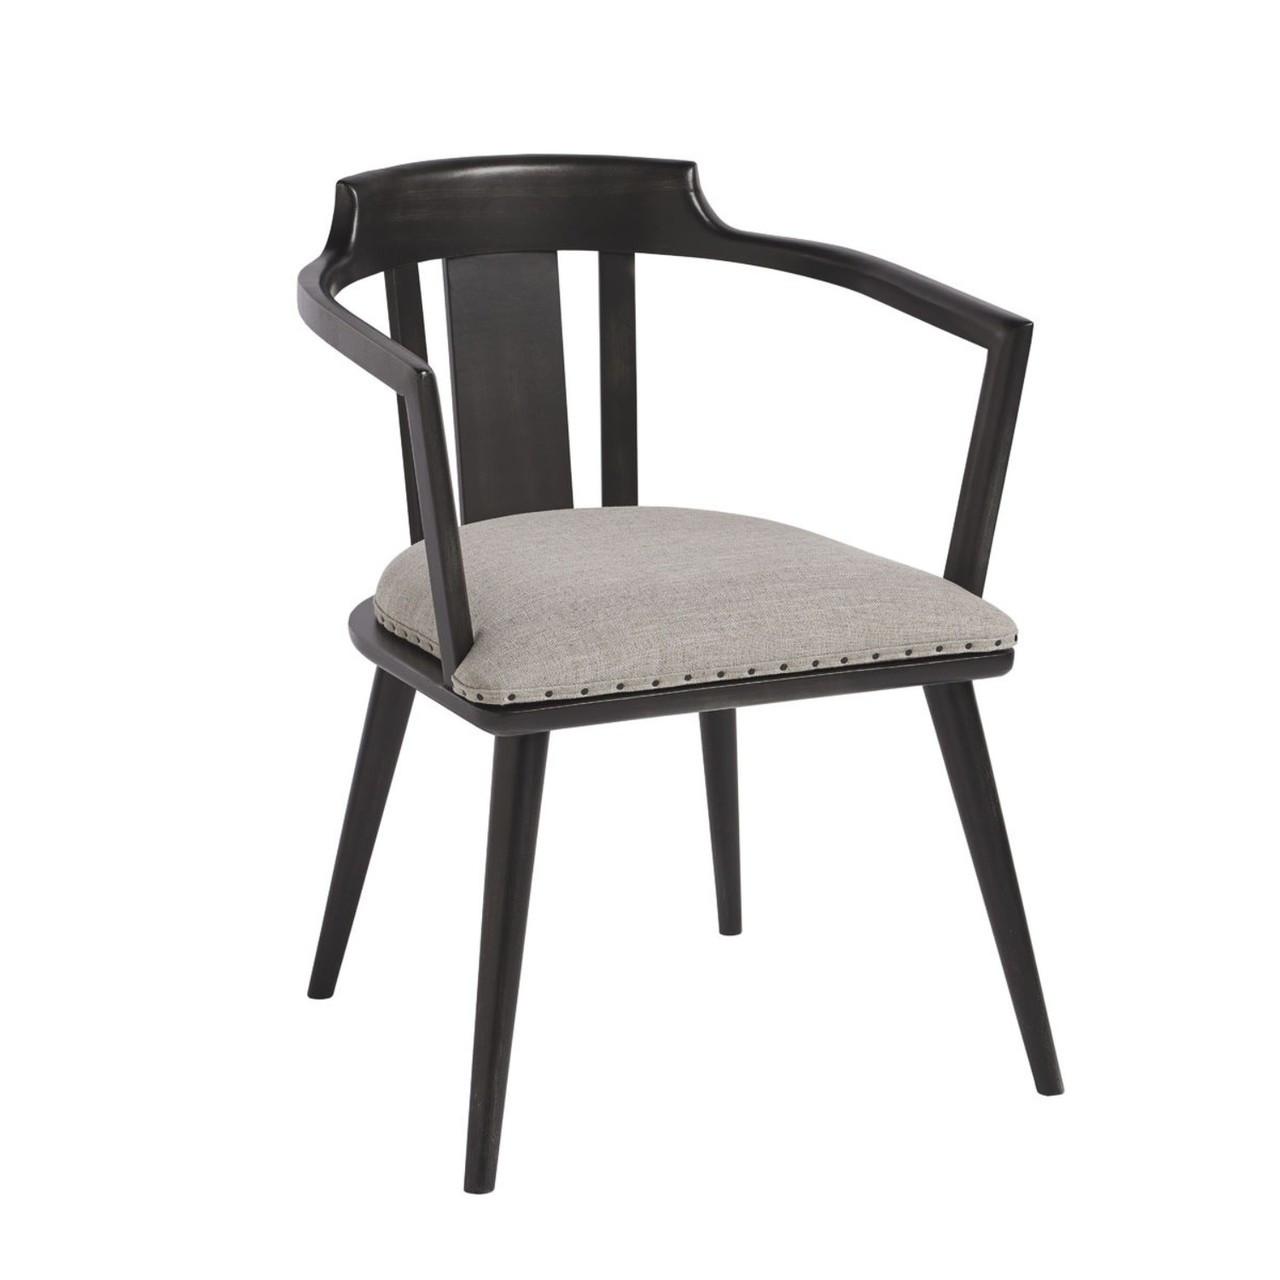 Admirable Windsor Mid Century Modern Barrel Back Side Chairs Ibusinesslaw Wood Chair Design Ideas Ibusinesslaworg